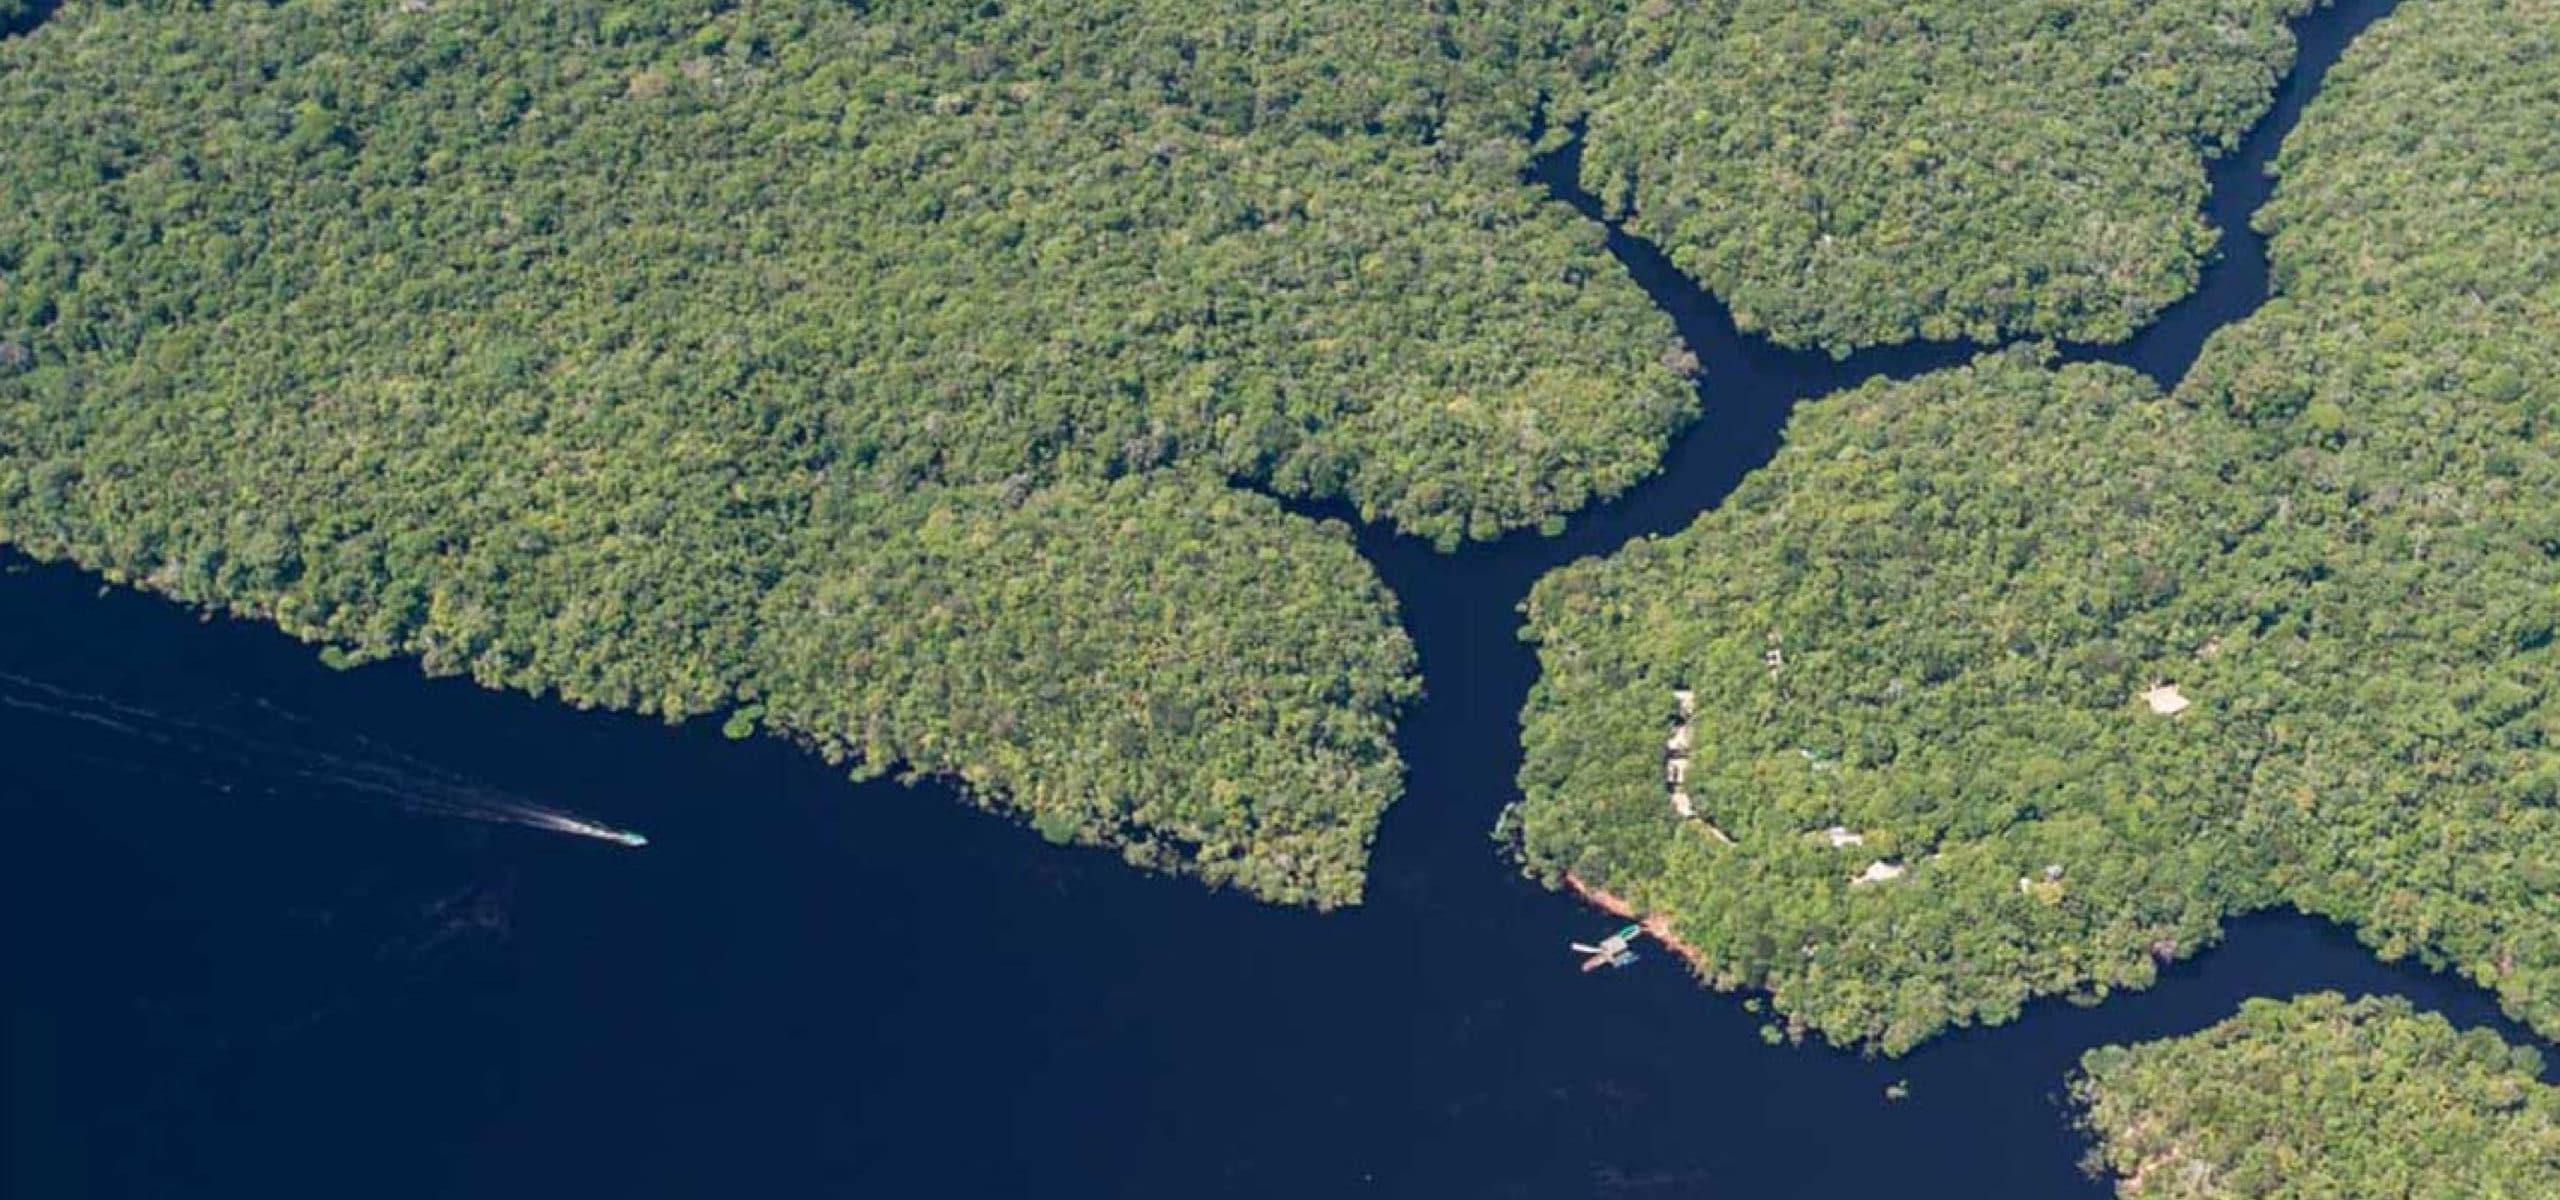 anavilhanas national park, Amazonas - RipioTurismo DMC for Brazil